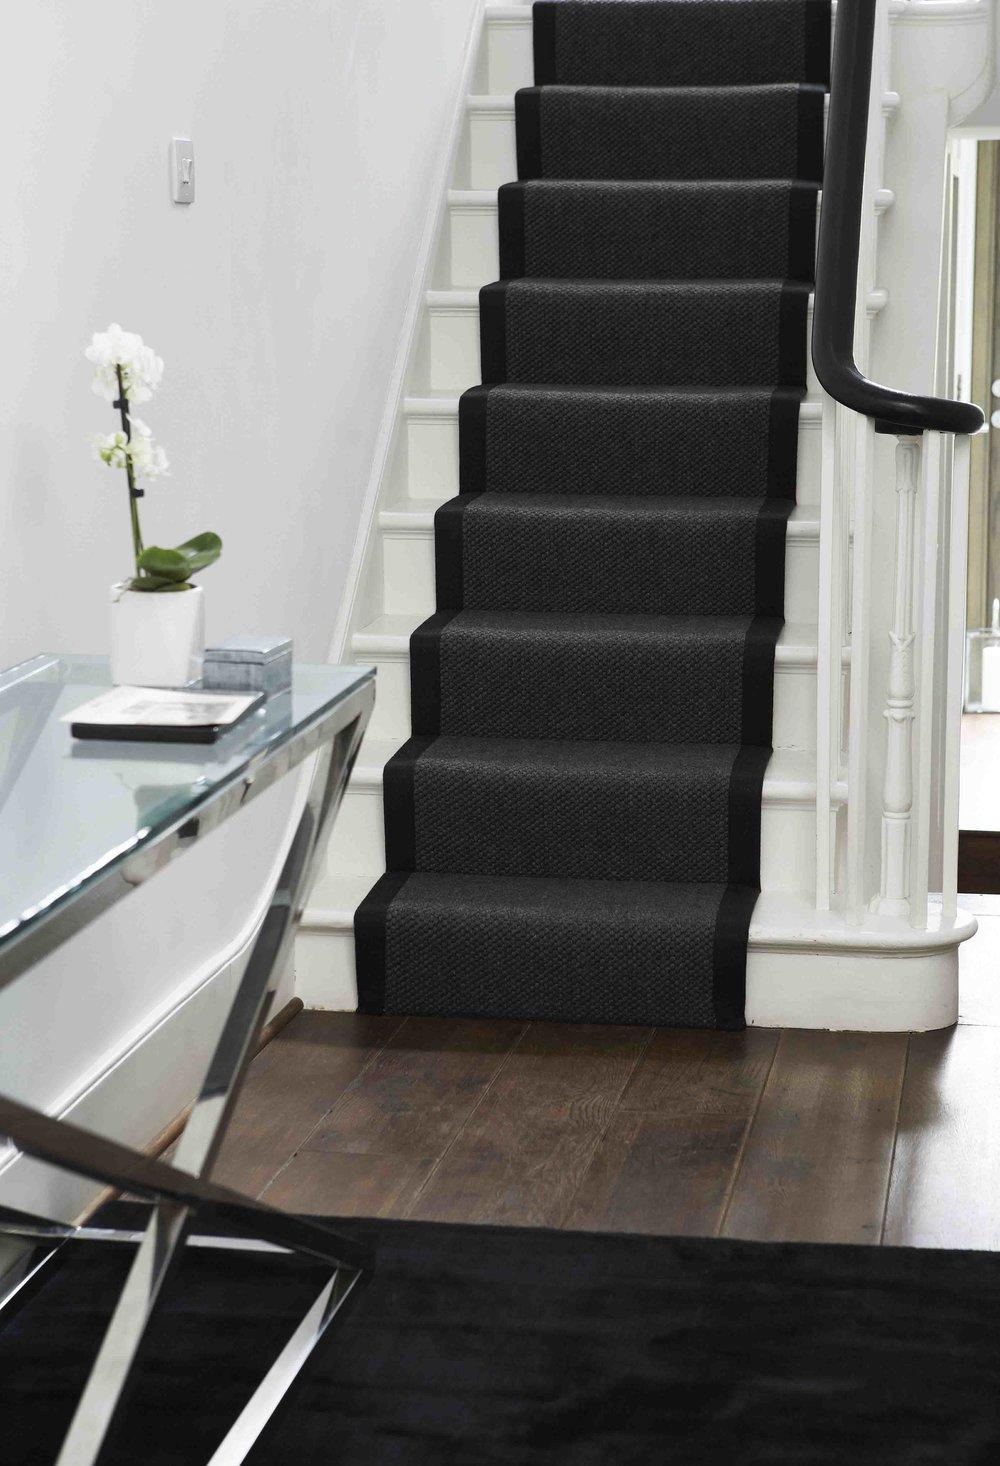 tapis-passage-escalier-surmesure-france.jpg